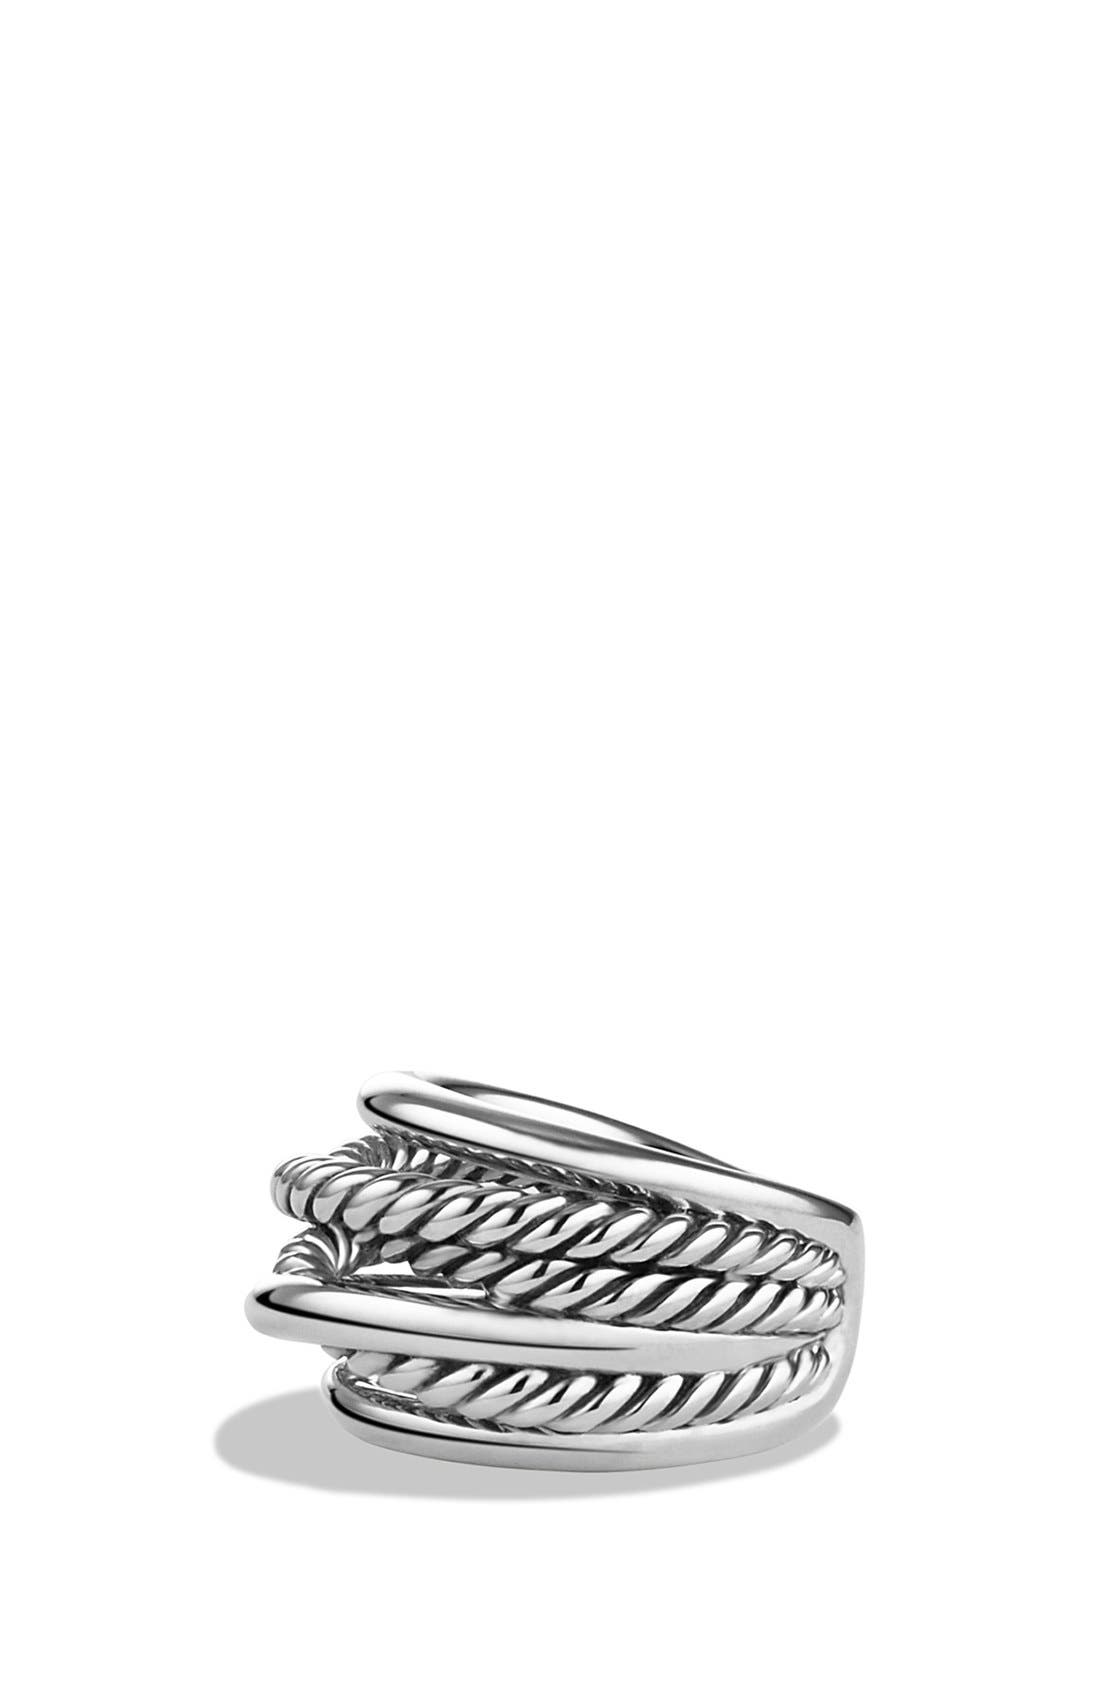 Alternate Image 1 Selected - David Yurman 'Crossover' Narrow Ring